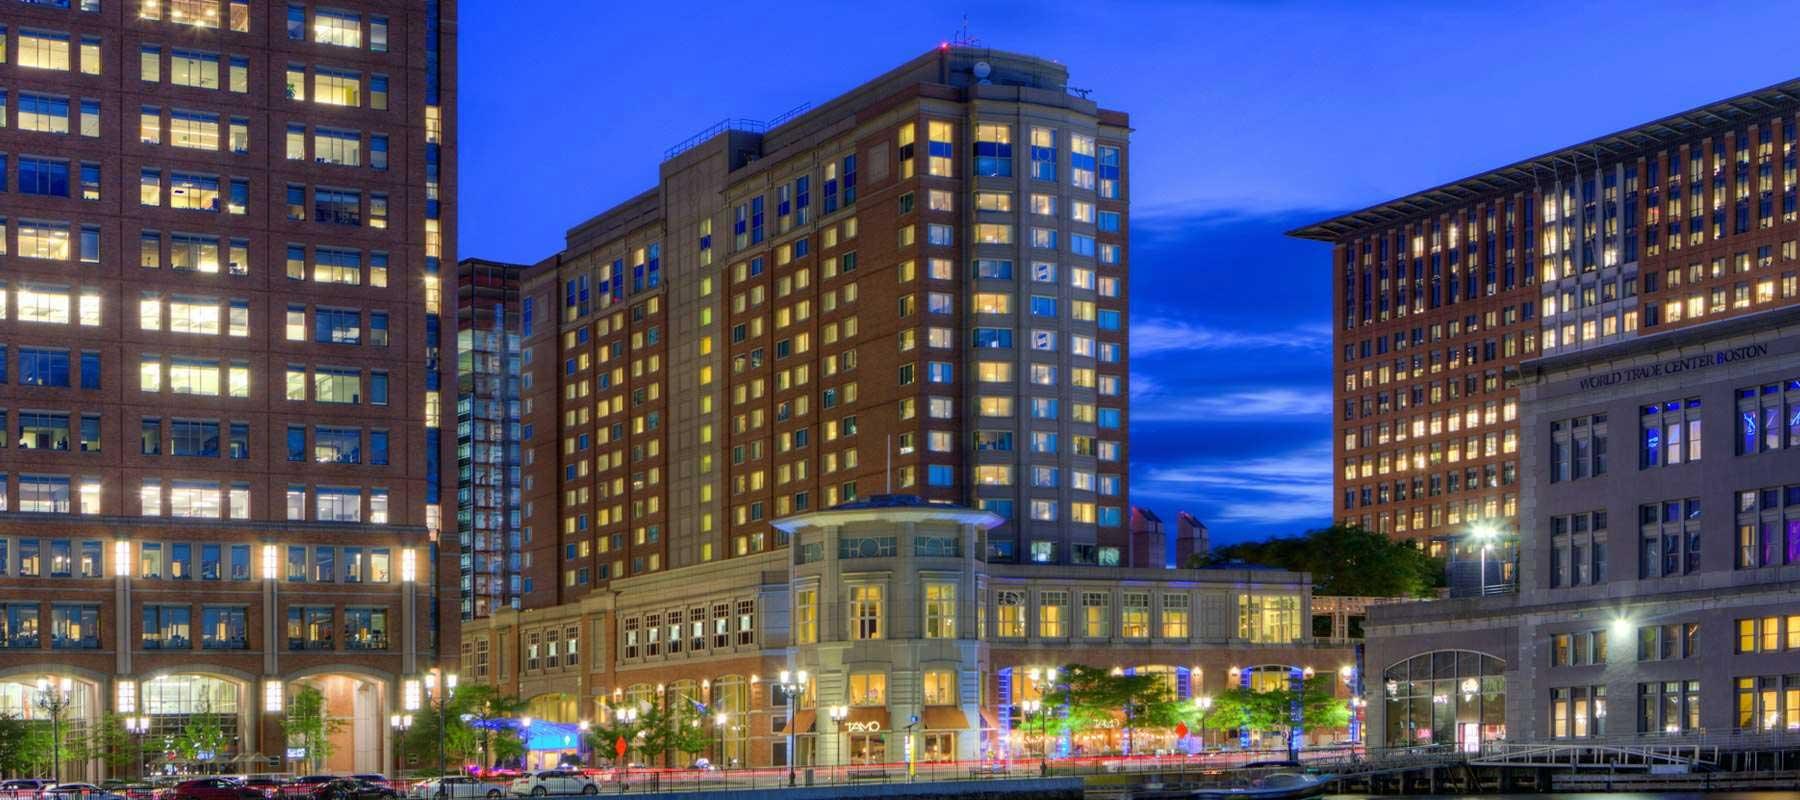 Hotels In Boston >> Boston Hotel In The Seaport District Seaport Hotel